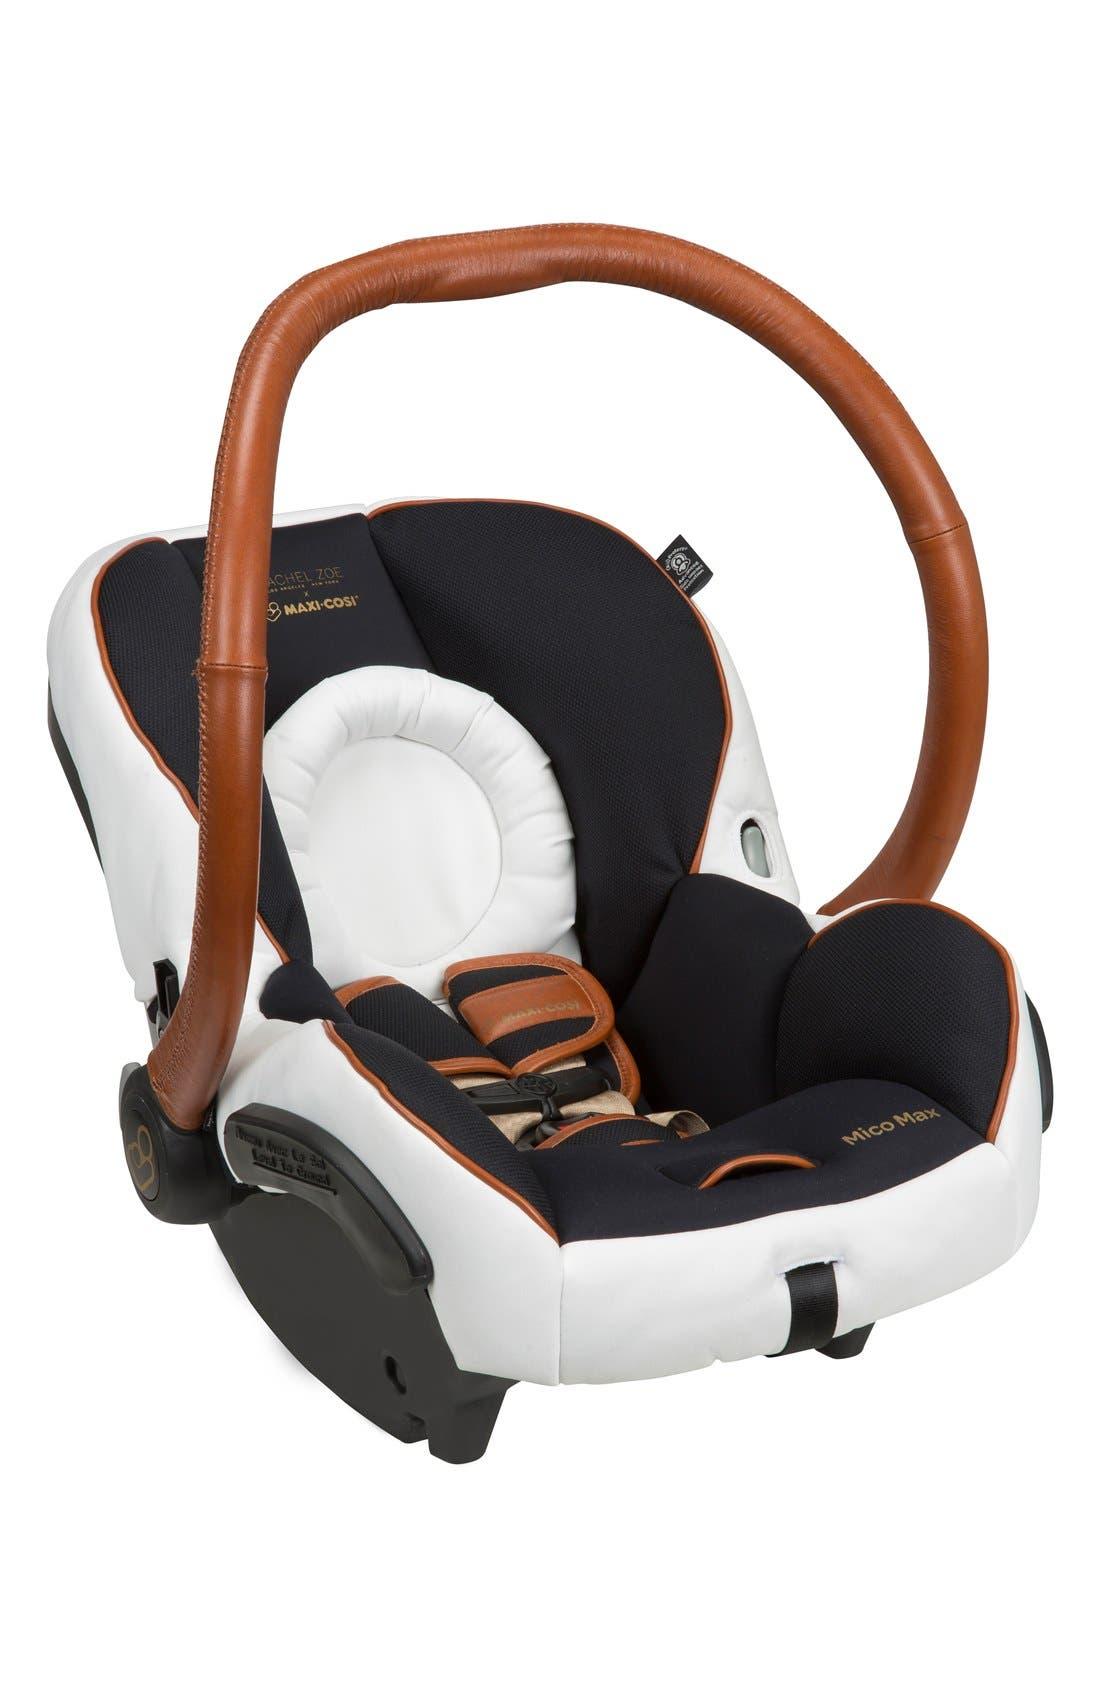 Main Image - Maxi-Cosi® x Rachel Zoe Mico Max 30 - Special Edition Infant Car Seat